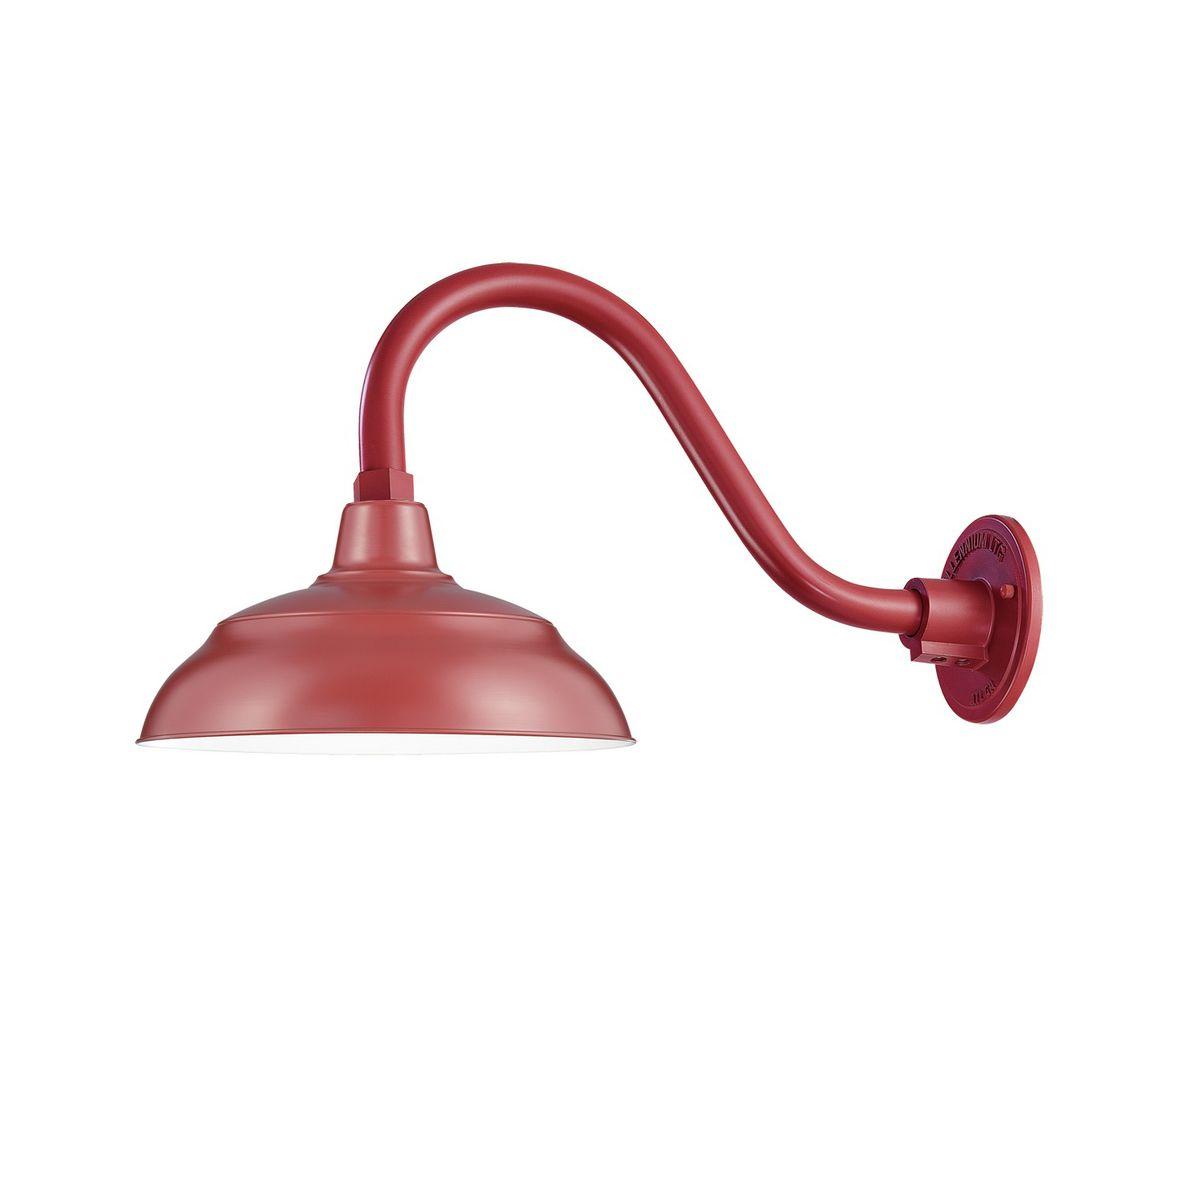 14 Satin Red Warehouse Shade With Gooseneck Barn Lighting Sign Lighting Shades